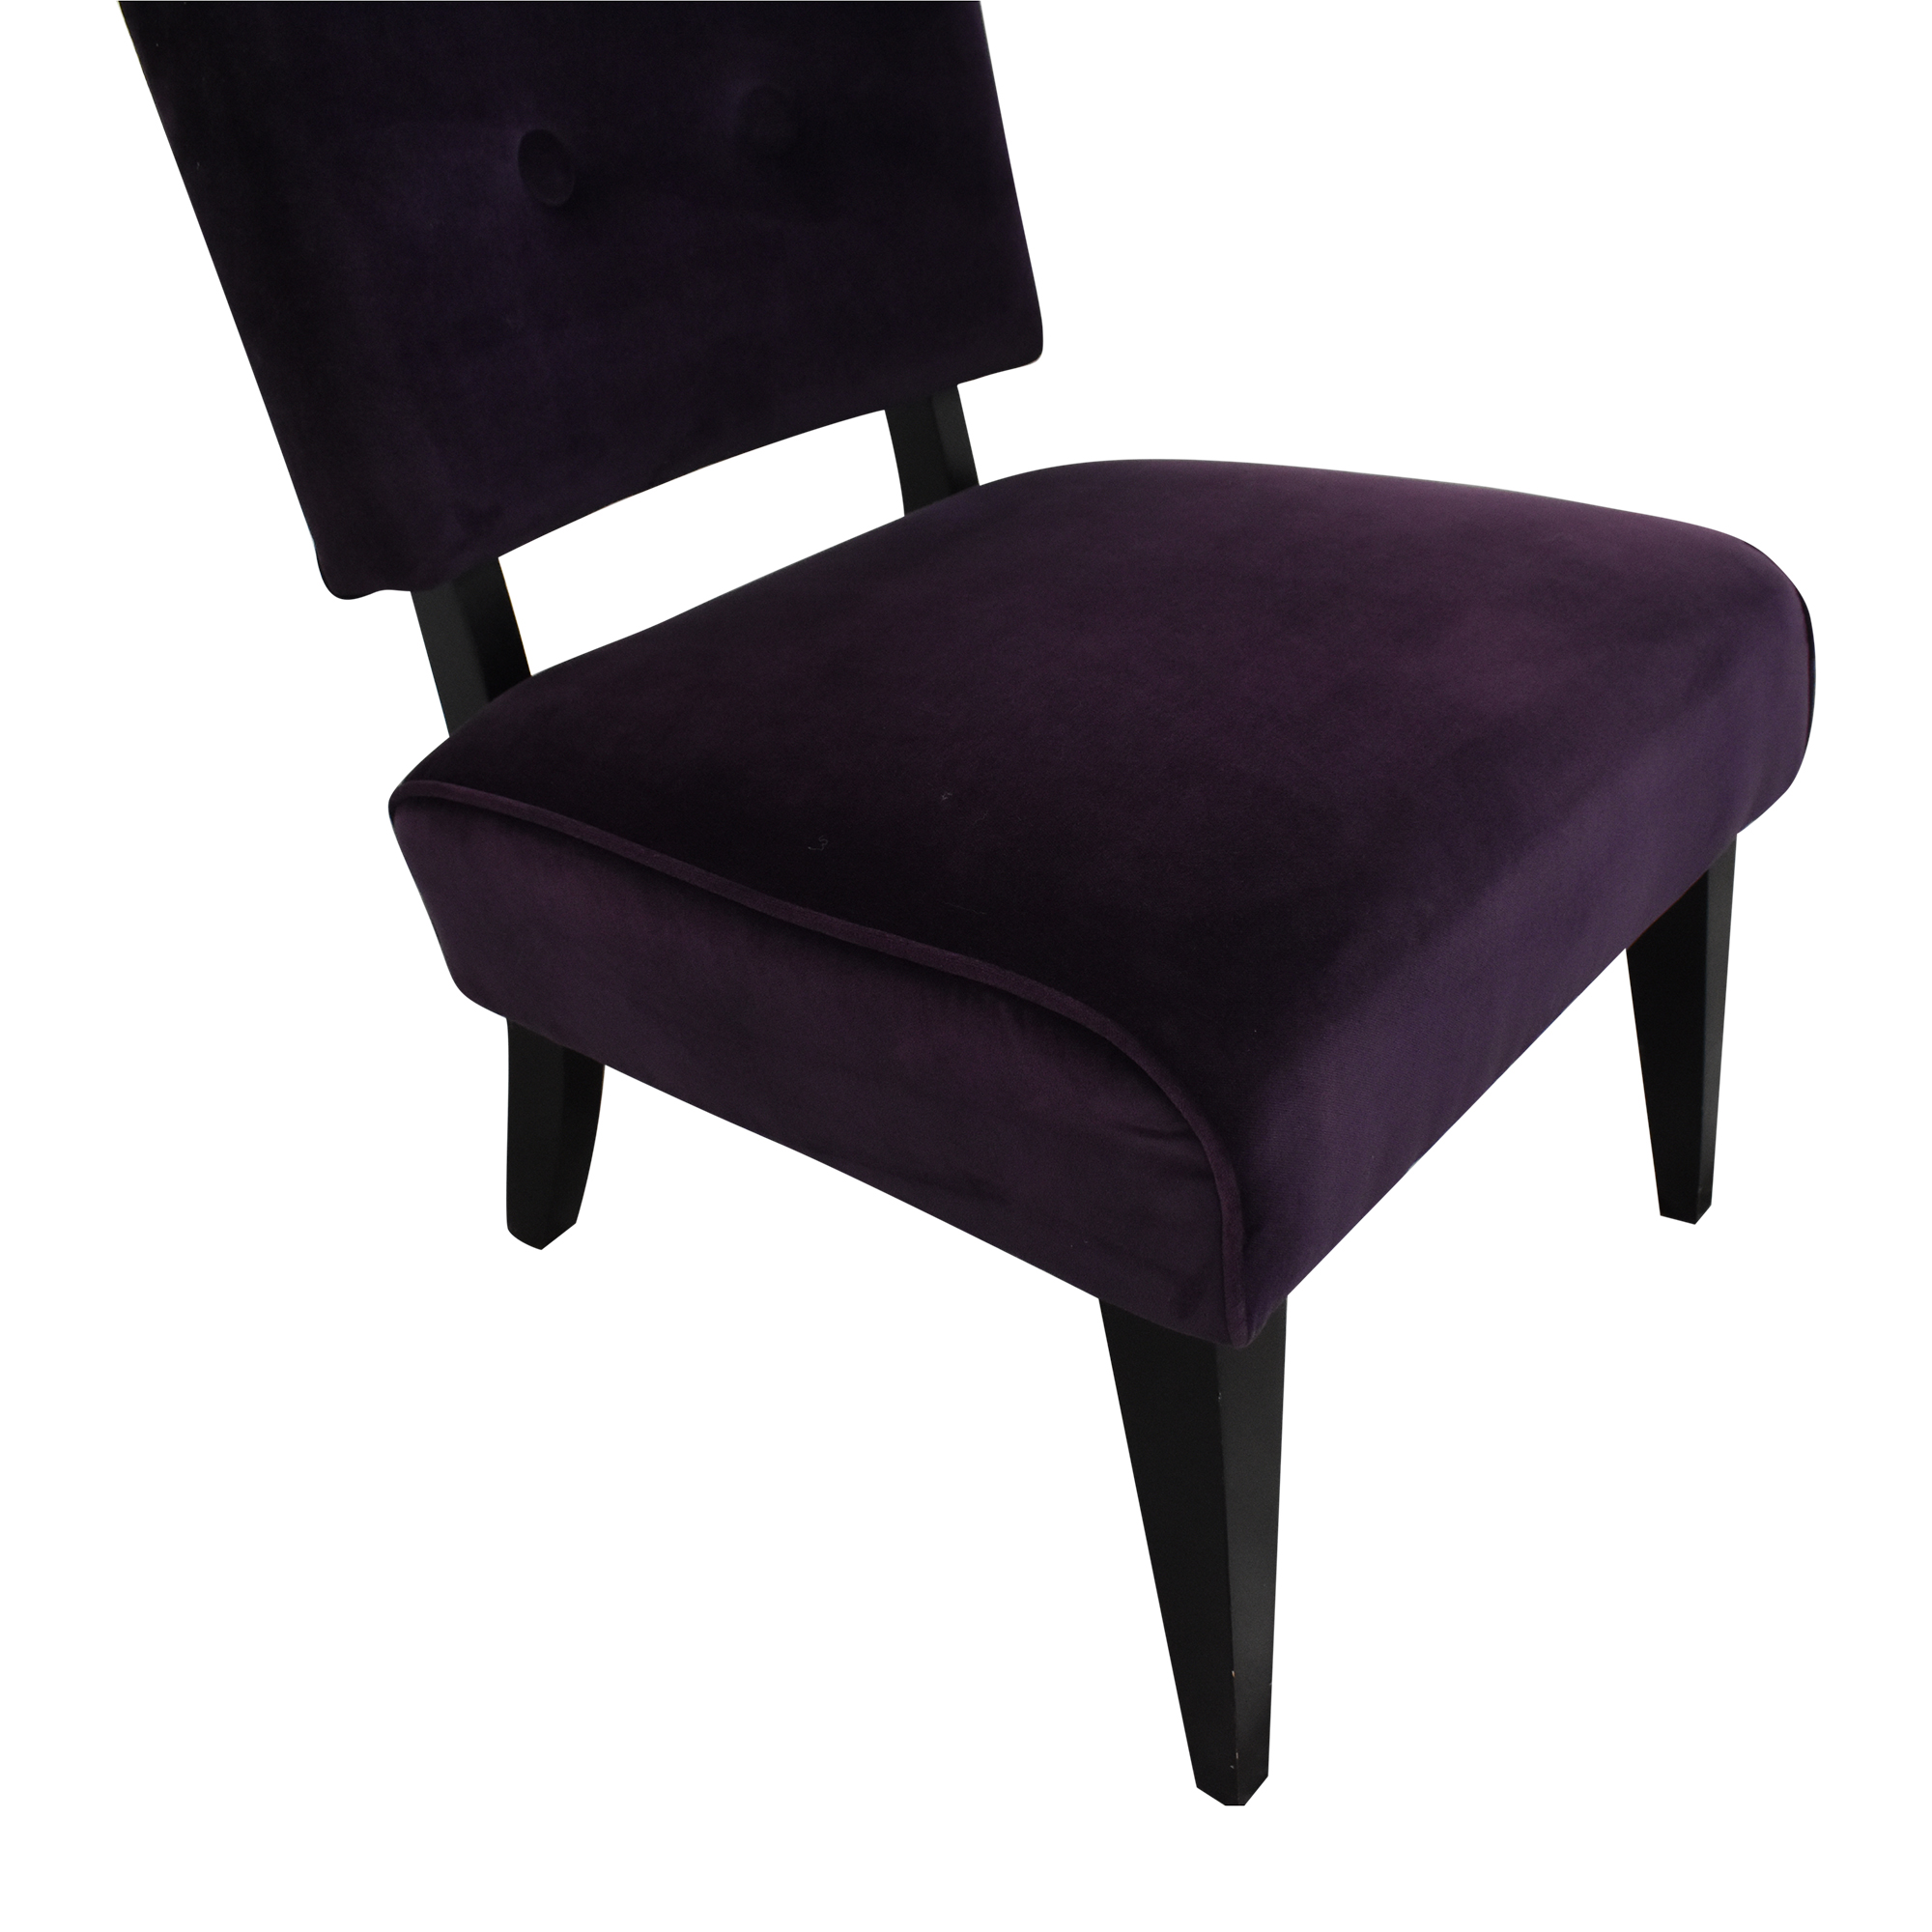 Crate & Barrel Crate & Barrel Accent Chair ma